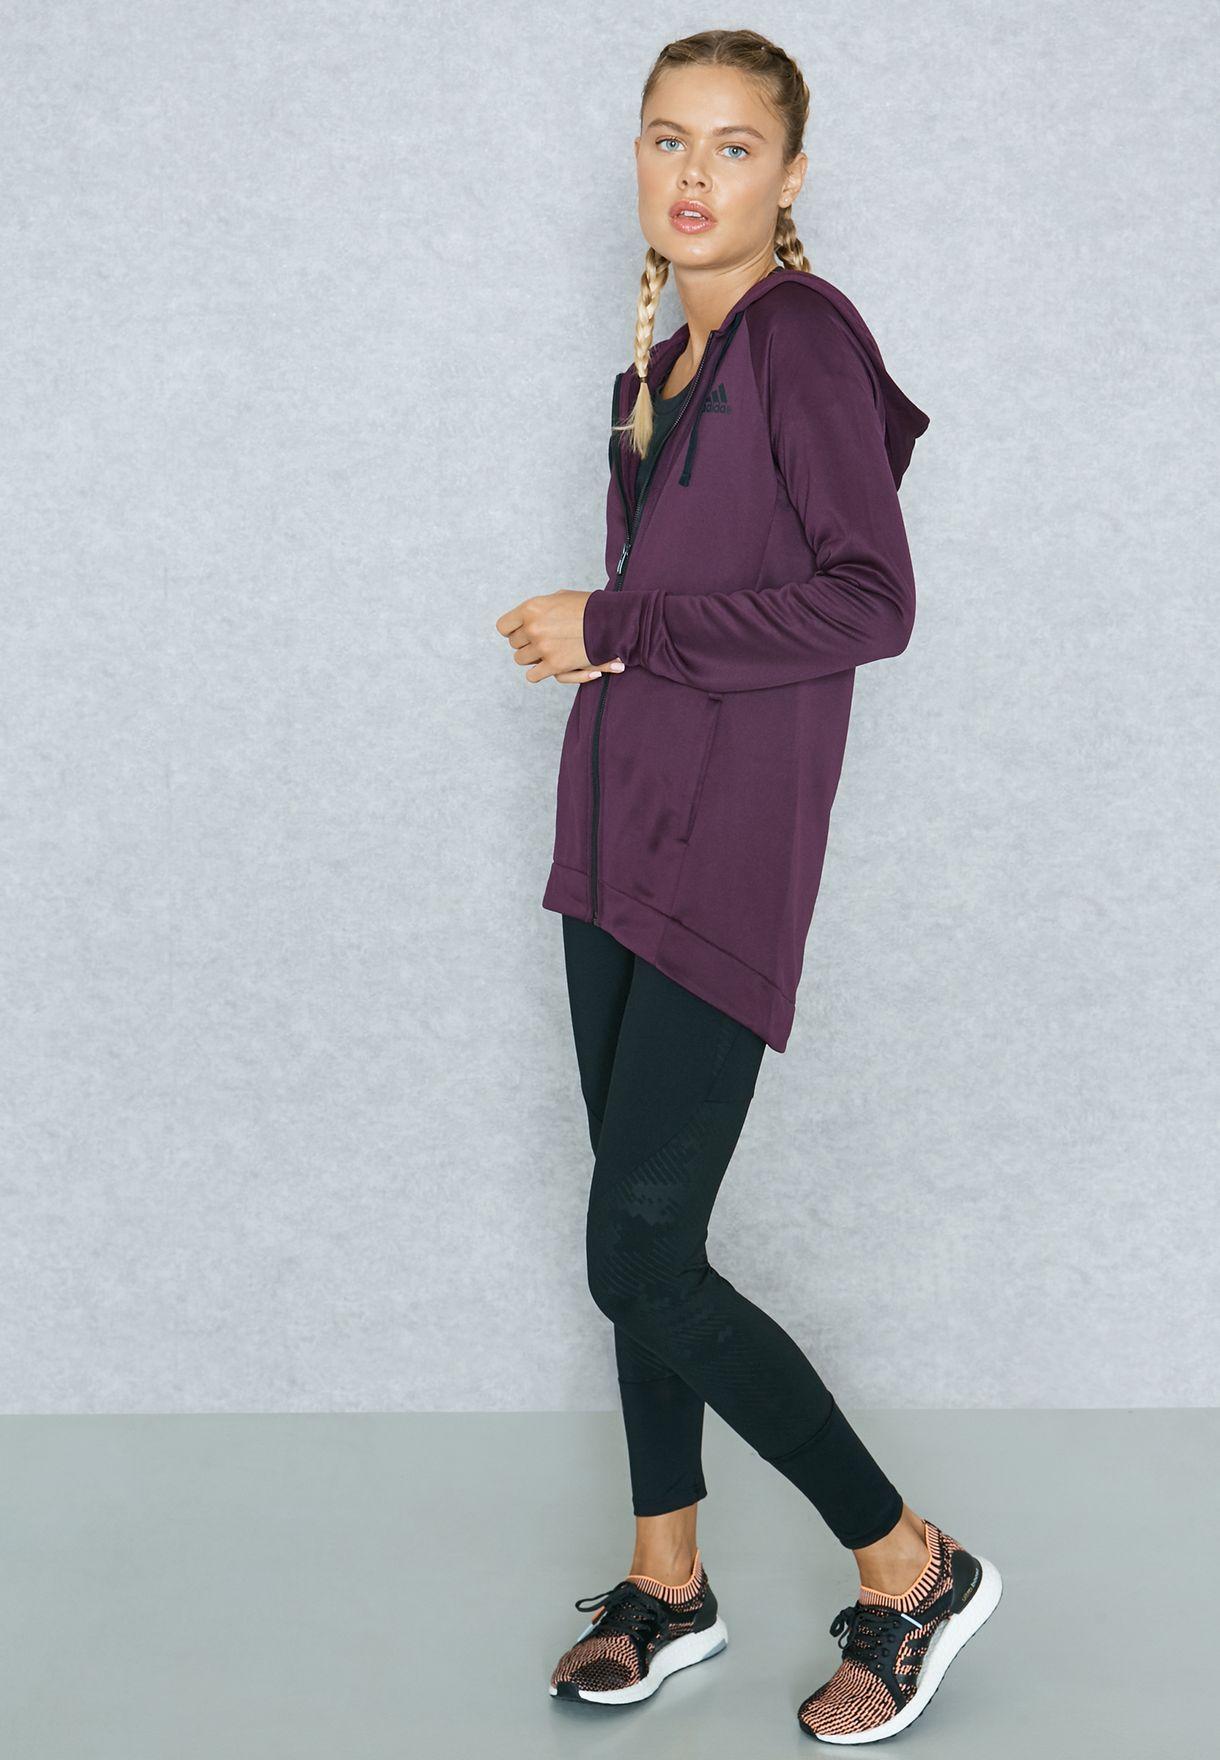 e2ebcfa4e17 Shop adidas multicolor Full Zip Hoodie & Tights Set BQ8384 for ...